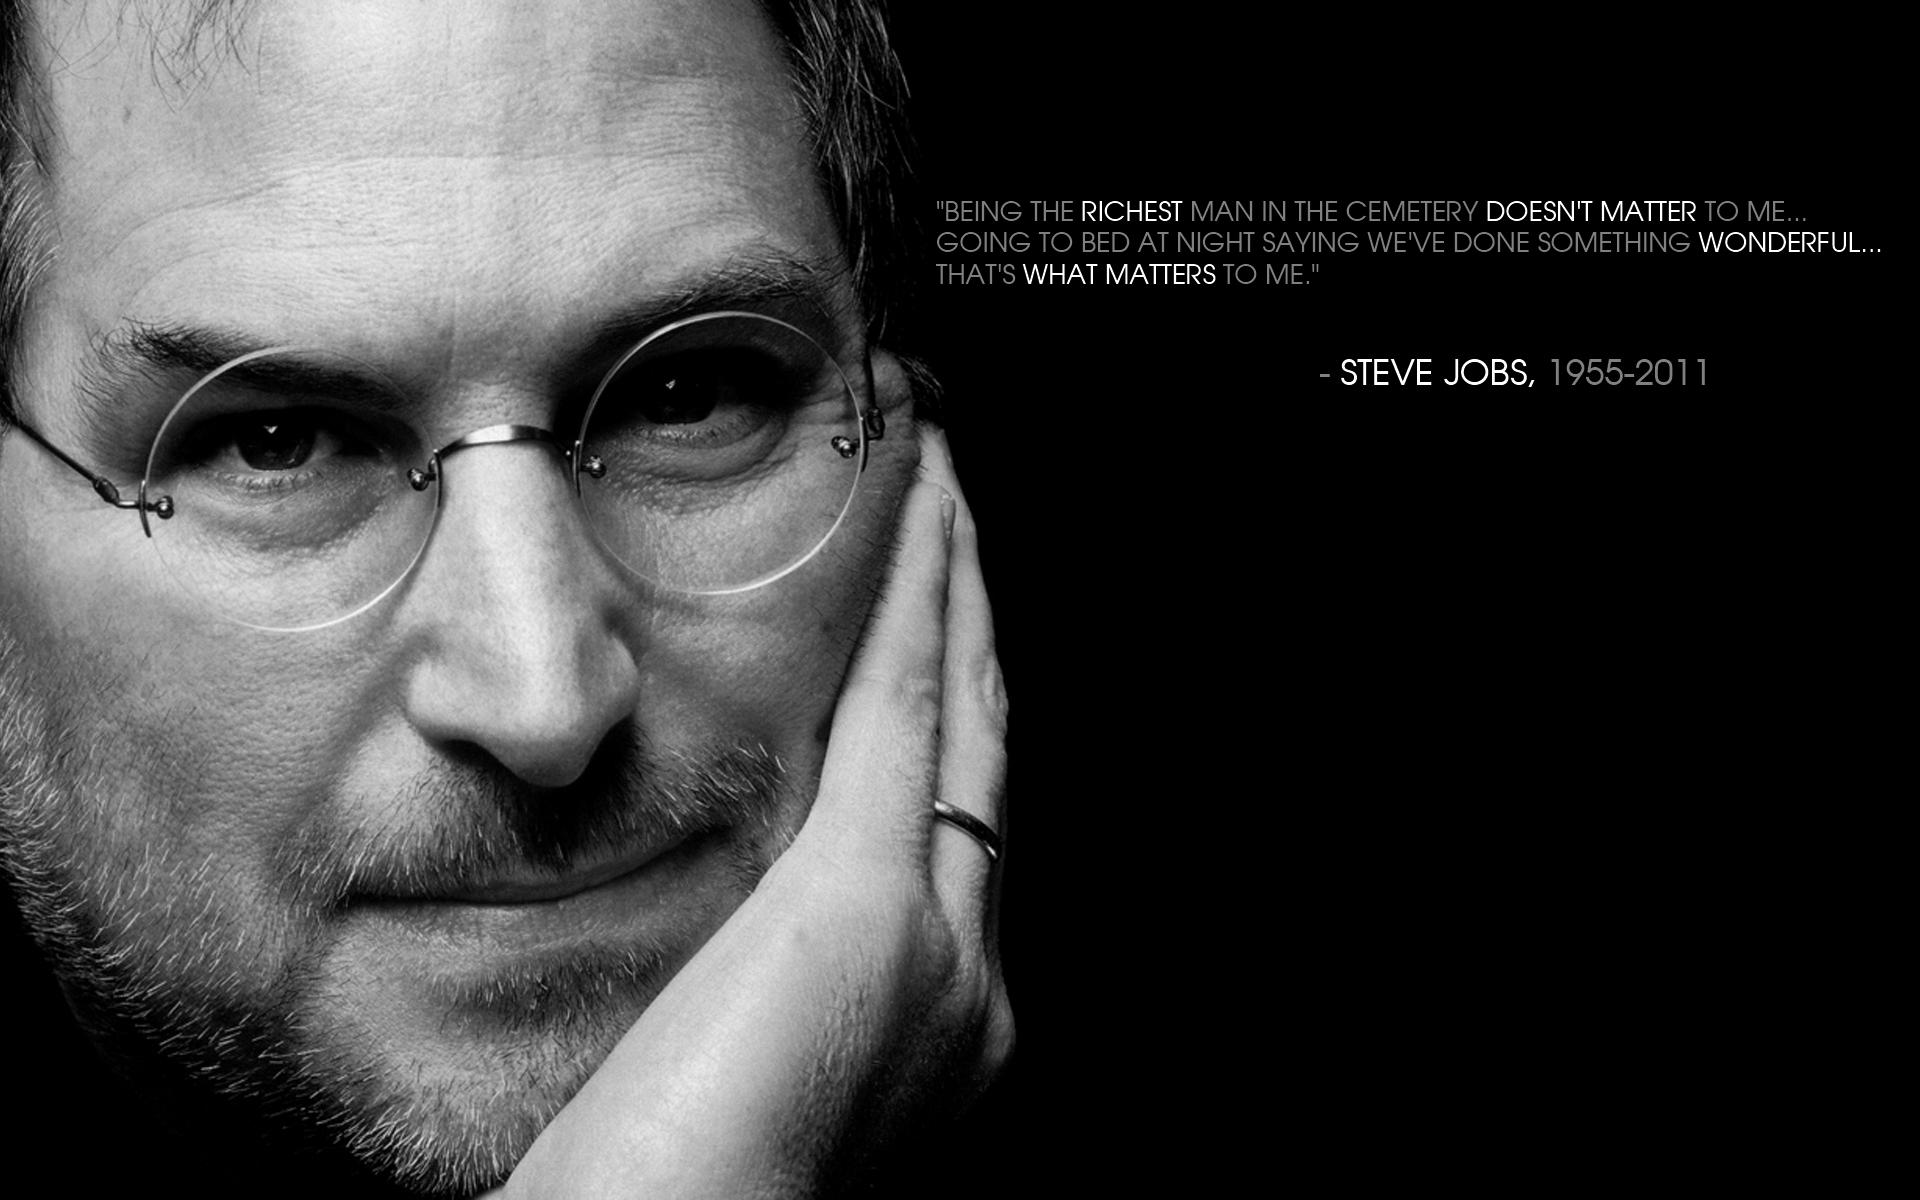 steve-jobs-quote-male-celebrity-hd-wallpaper-